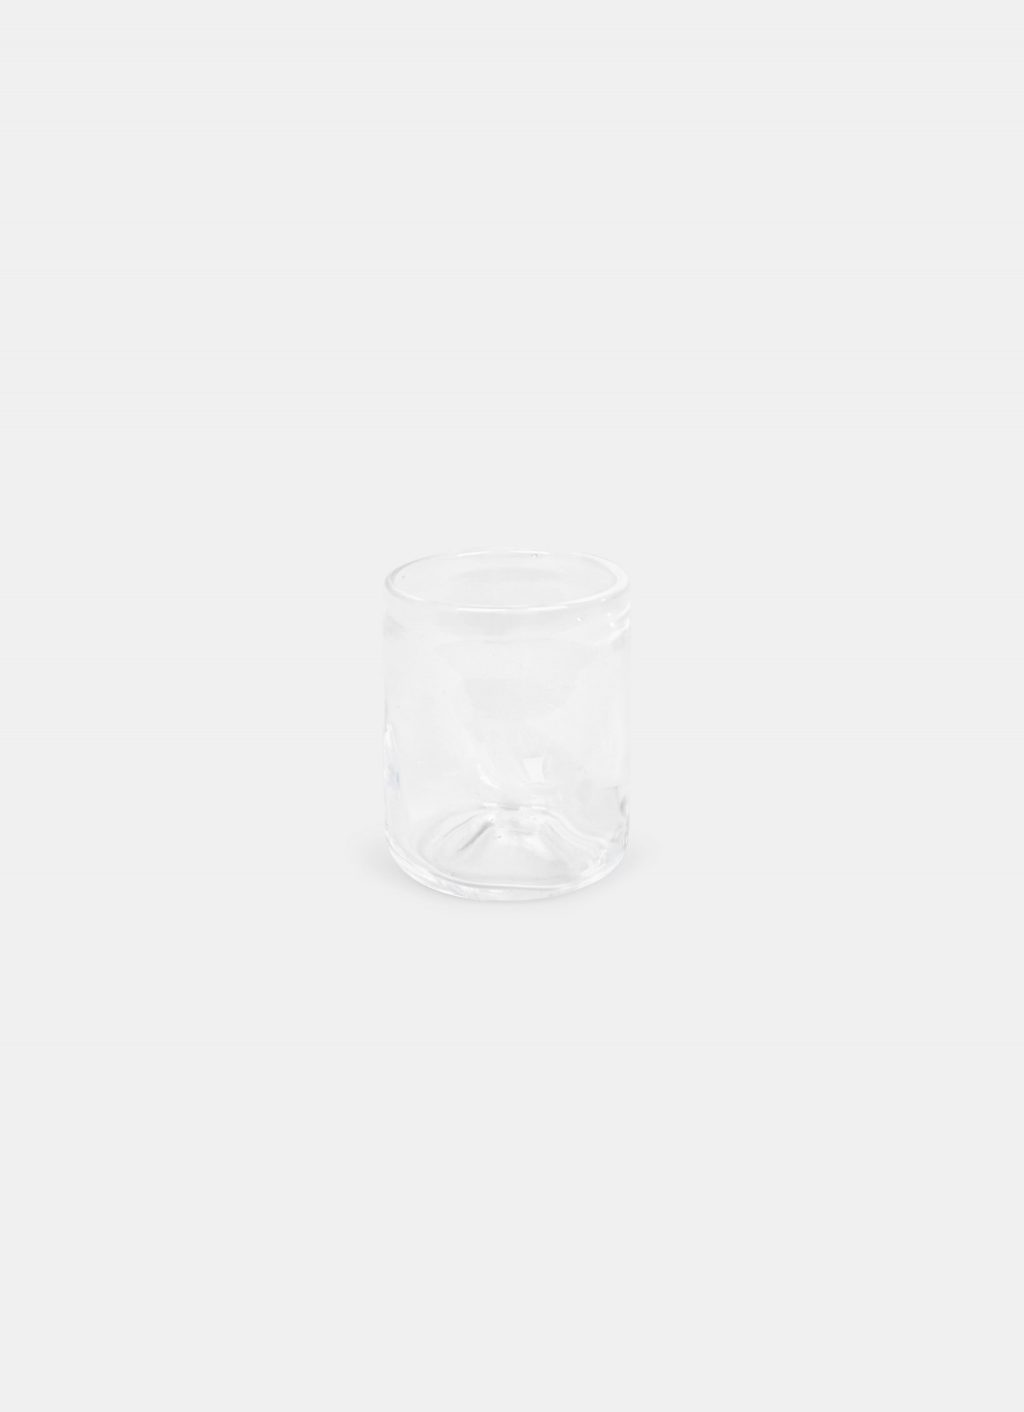 Frama - Glassware - Studio 0405 - Glass small